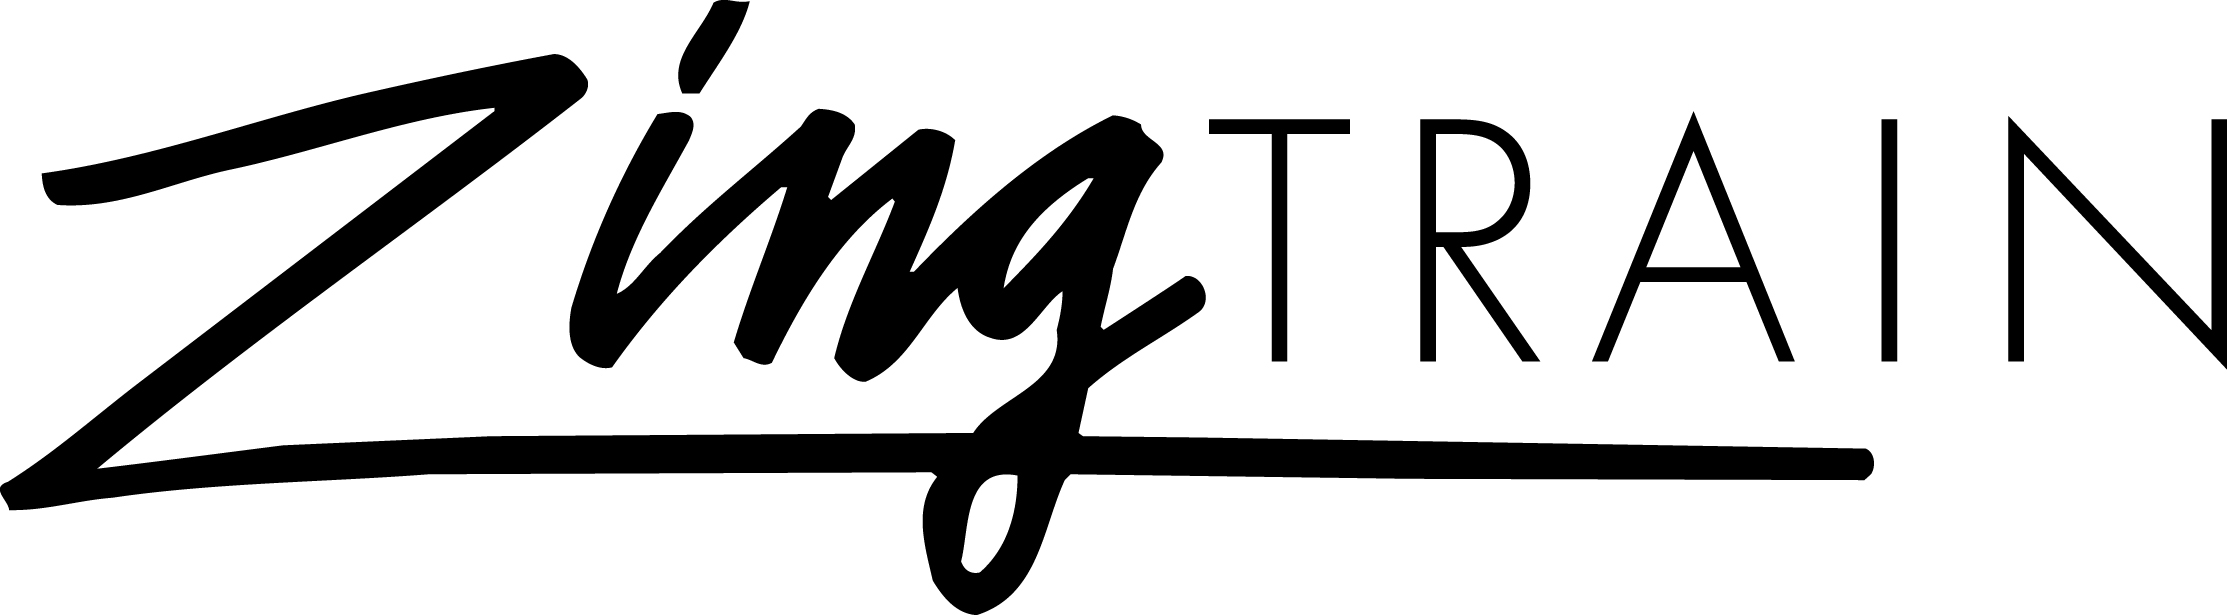 ZTrain-logo